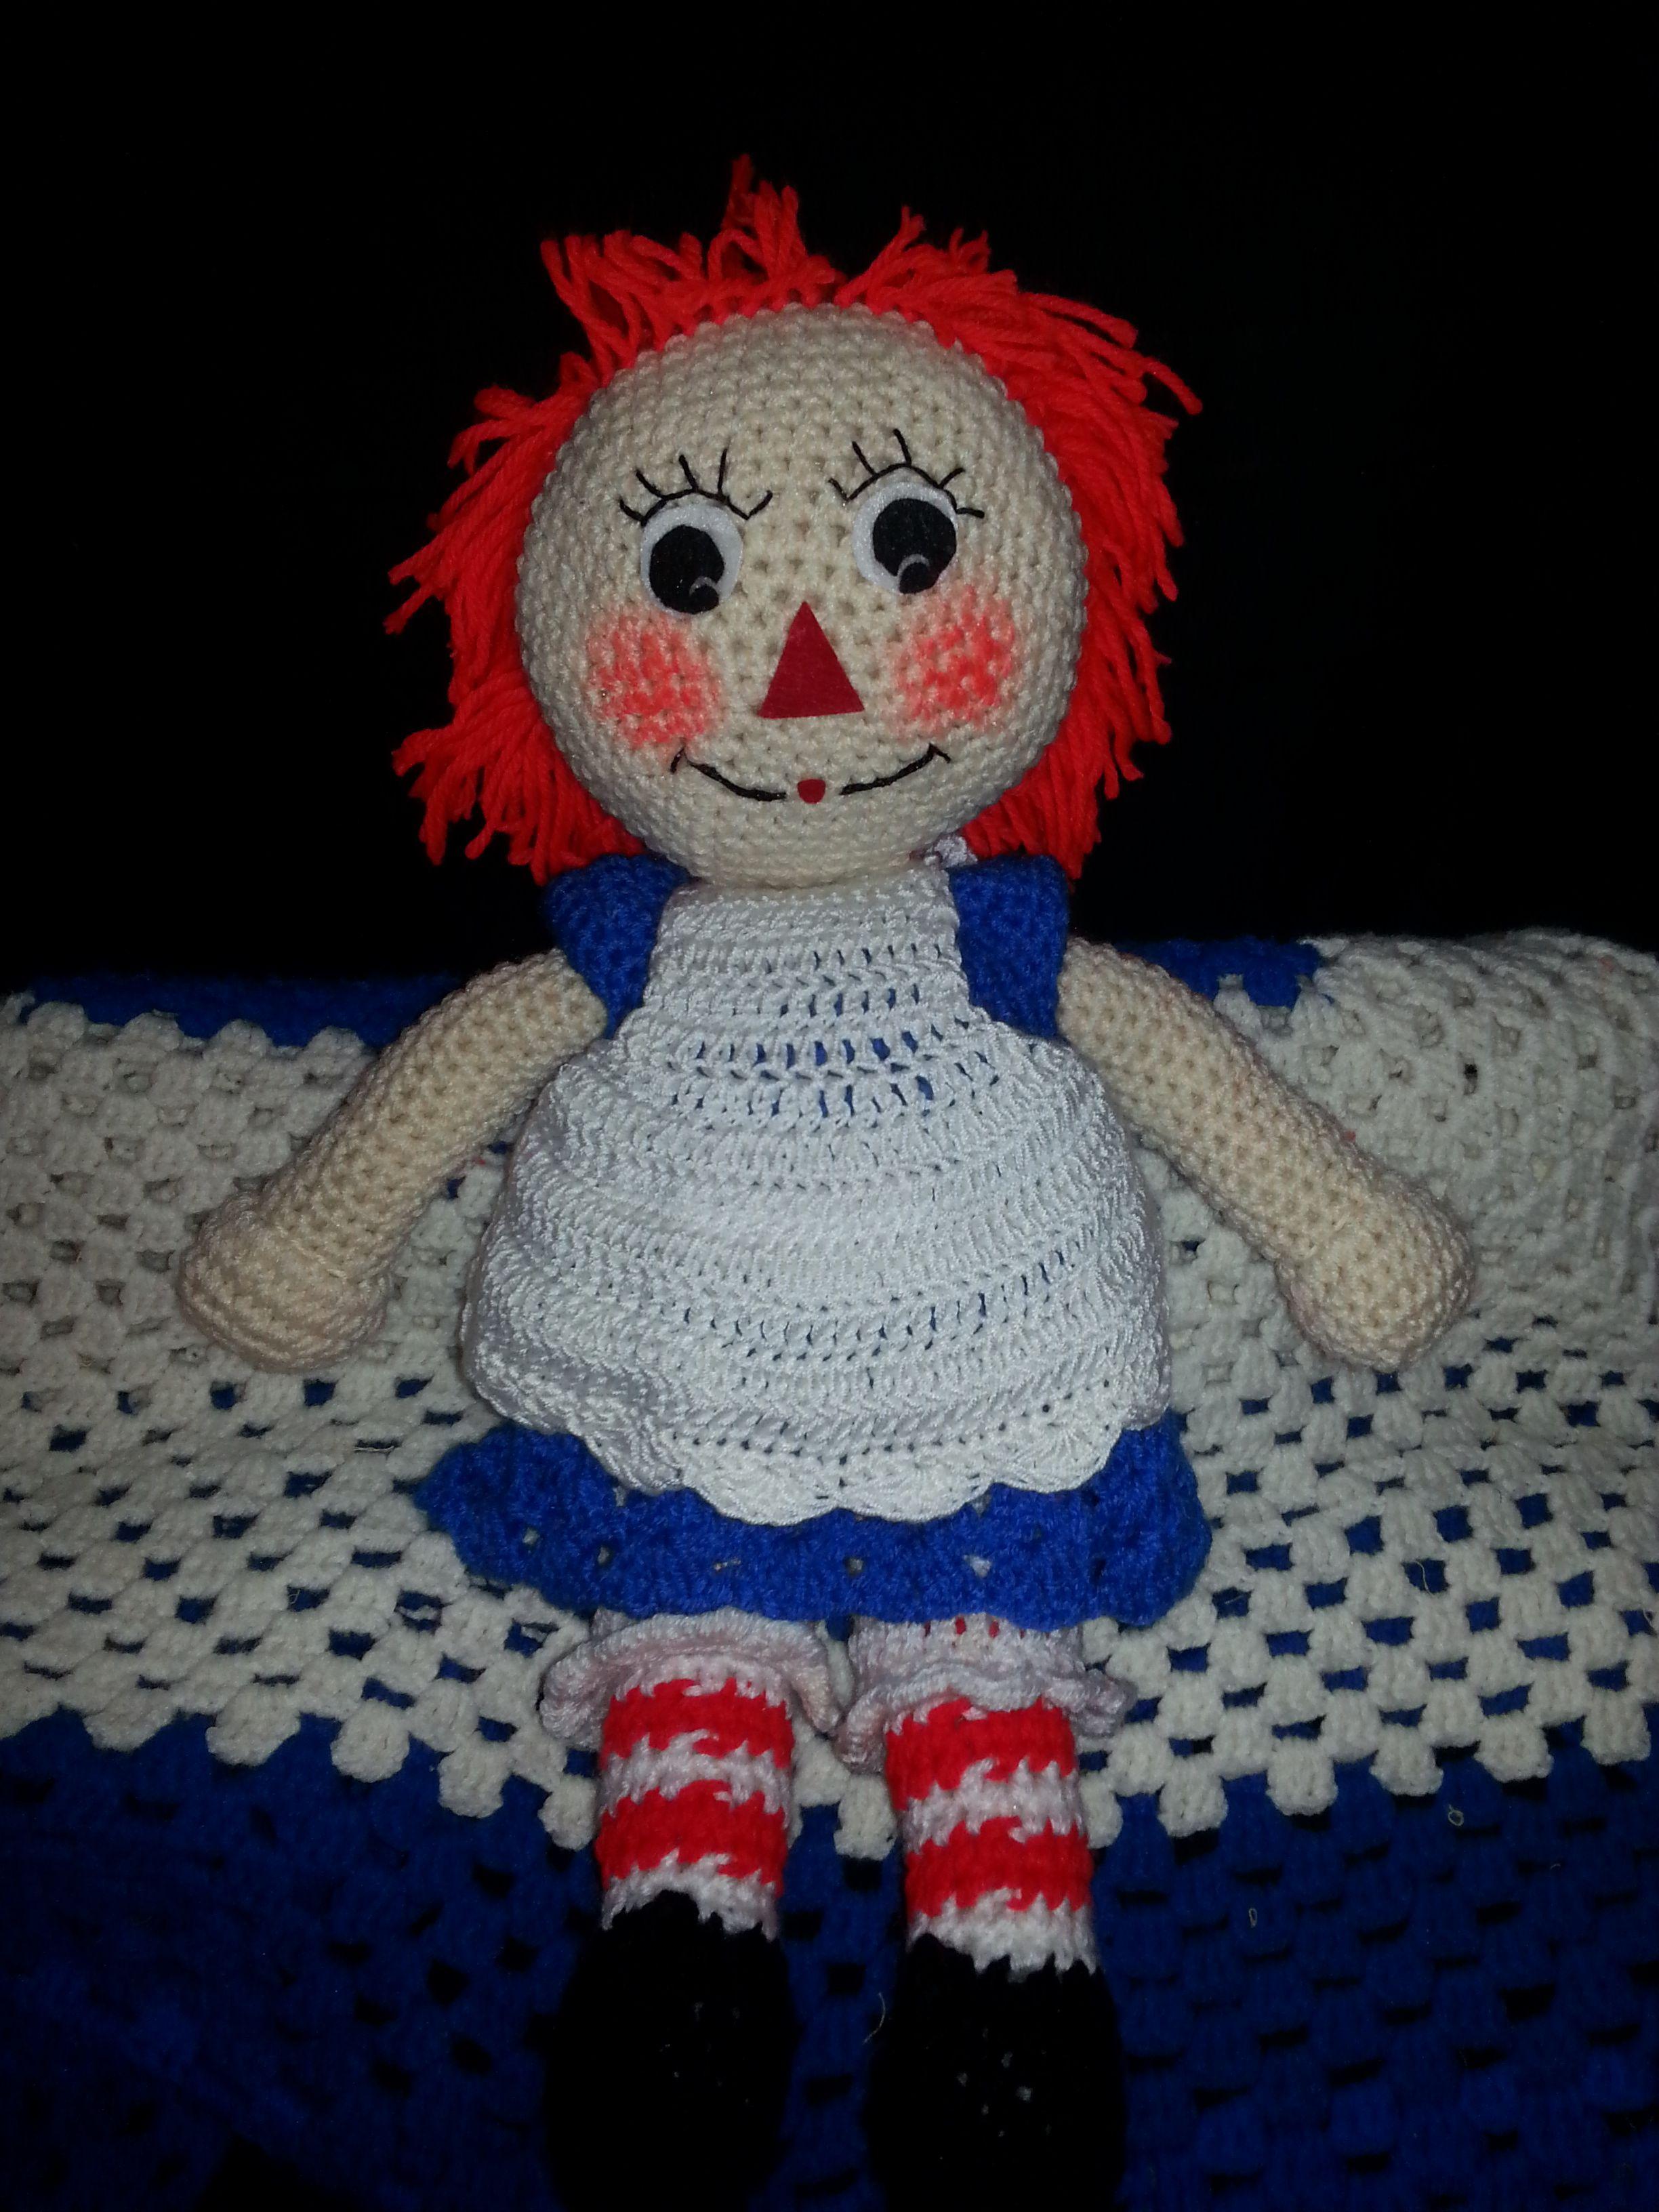 My version of Raggedy Ann www.facebook.com/bearmeups